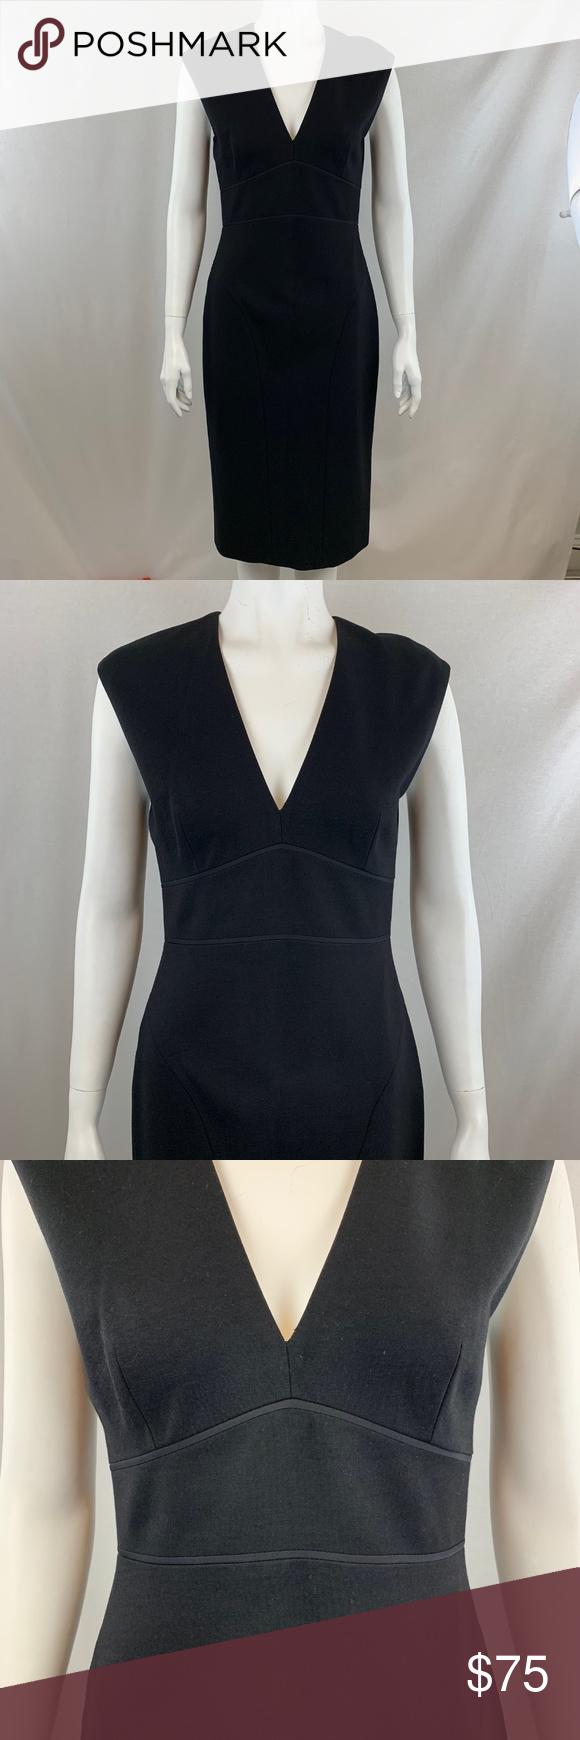 Elie Tahari Black V Neck Sheath Dress Size 4 Elie Tahari Black V Neck Sheath Dress Size 4 Mint Condition Classy An Sheath Dress Elie Tahari Dresses Dresses [ 1740 x 580 Pixel ]